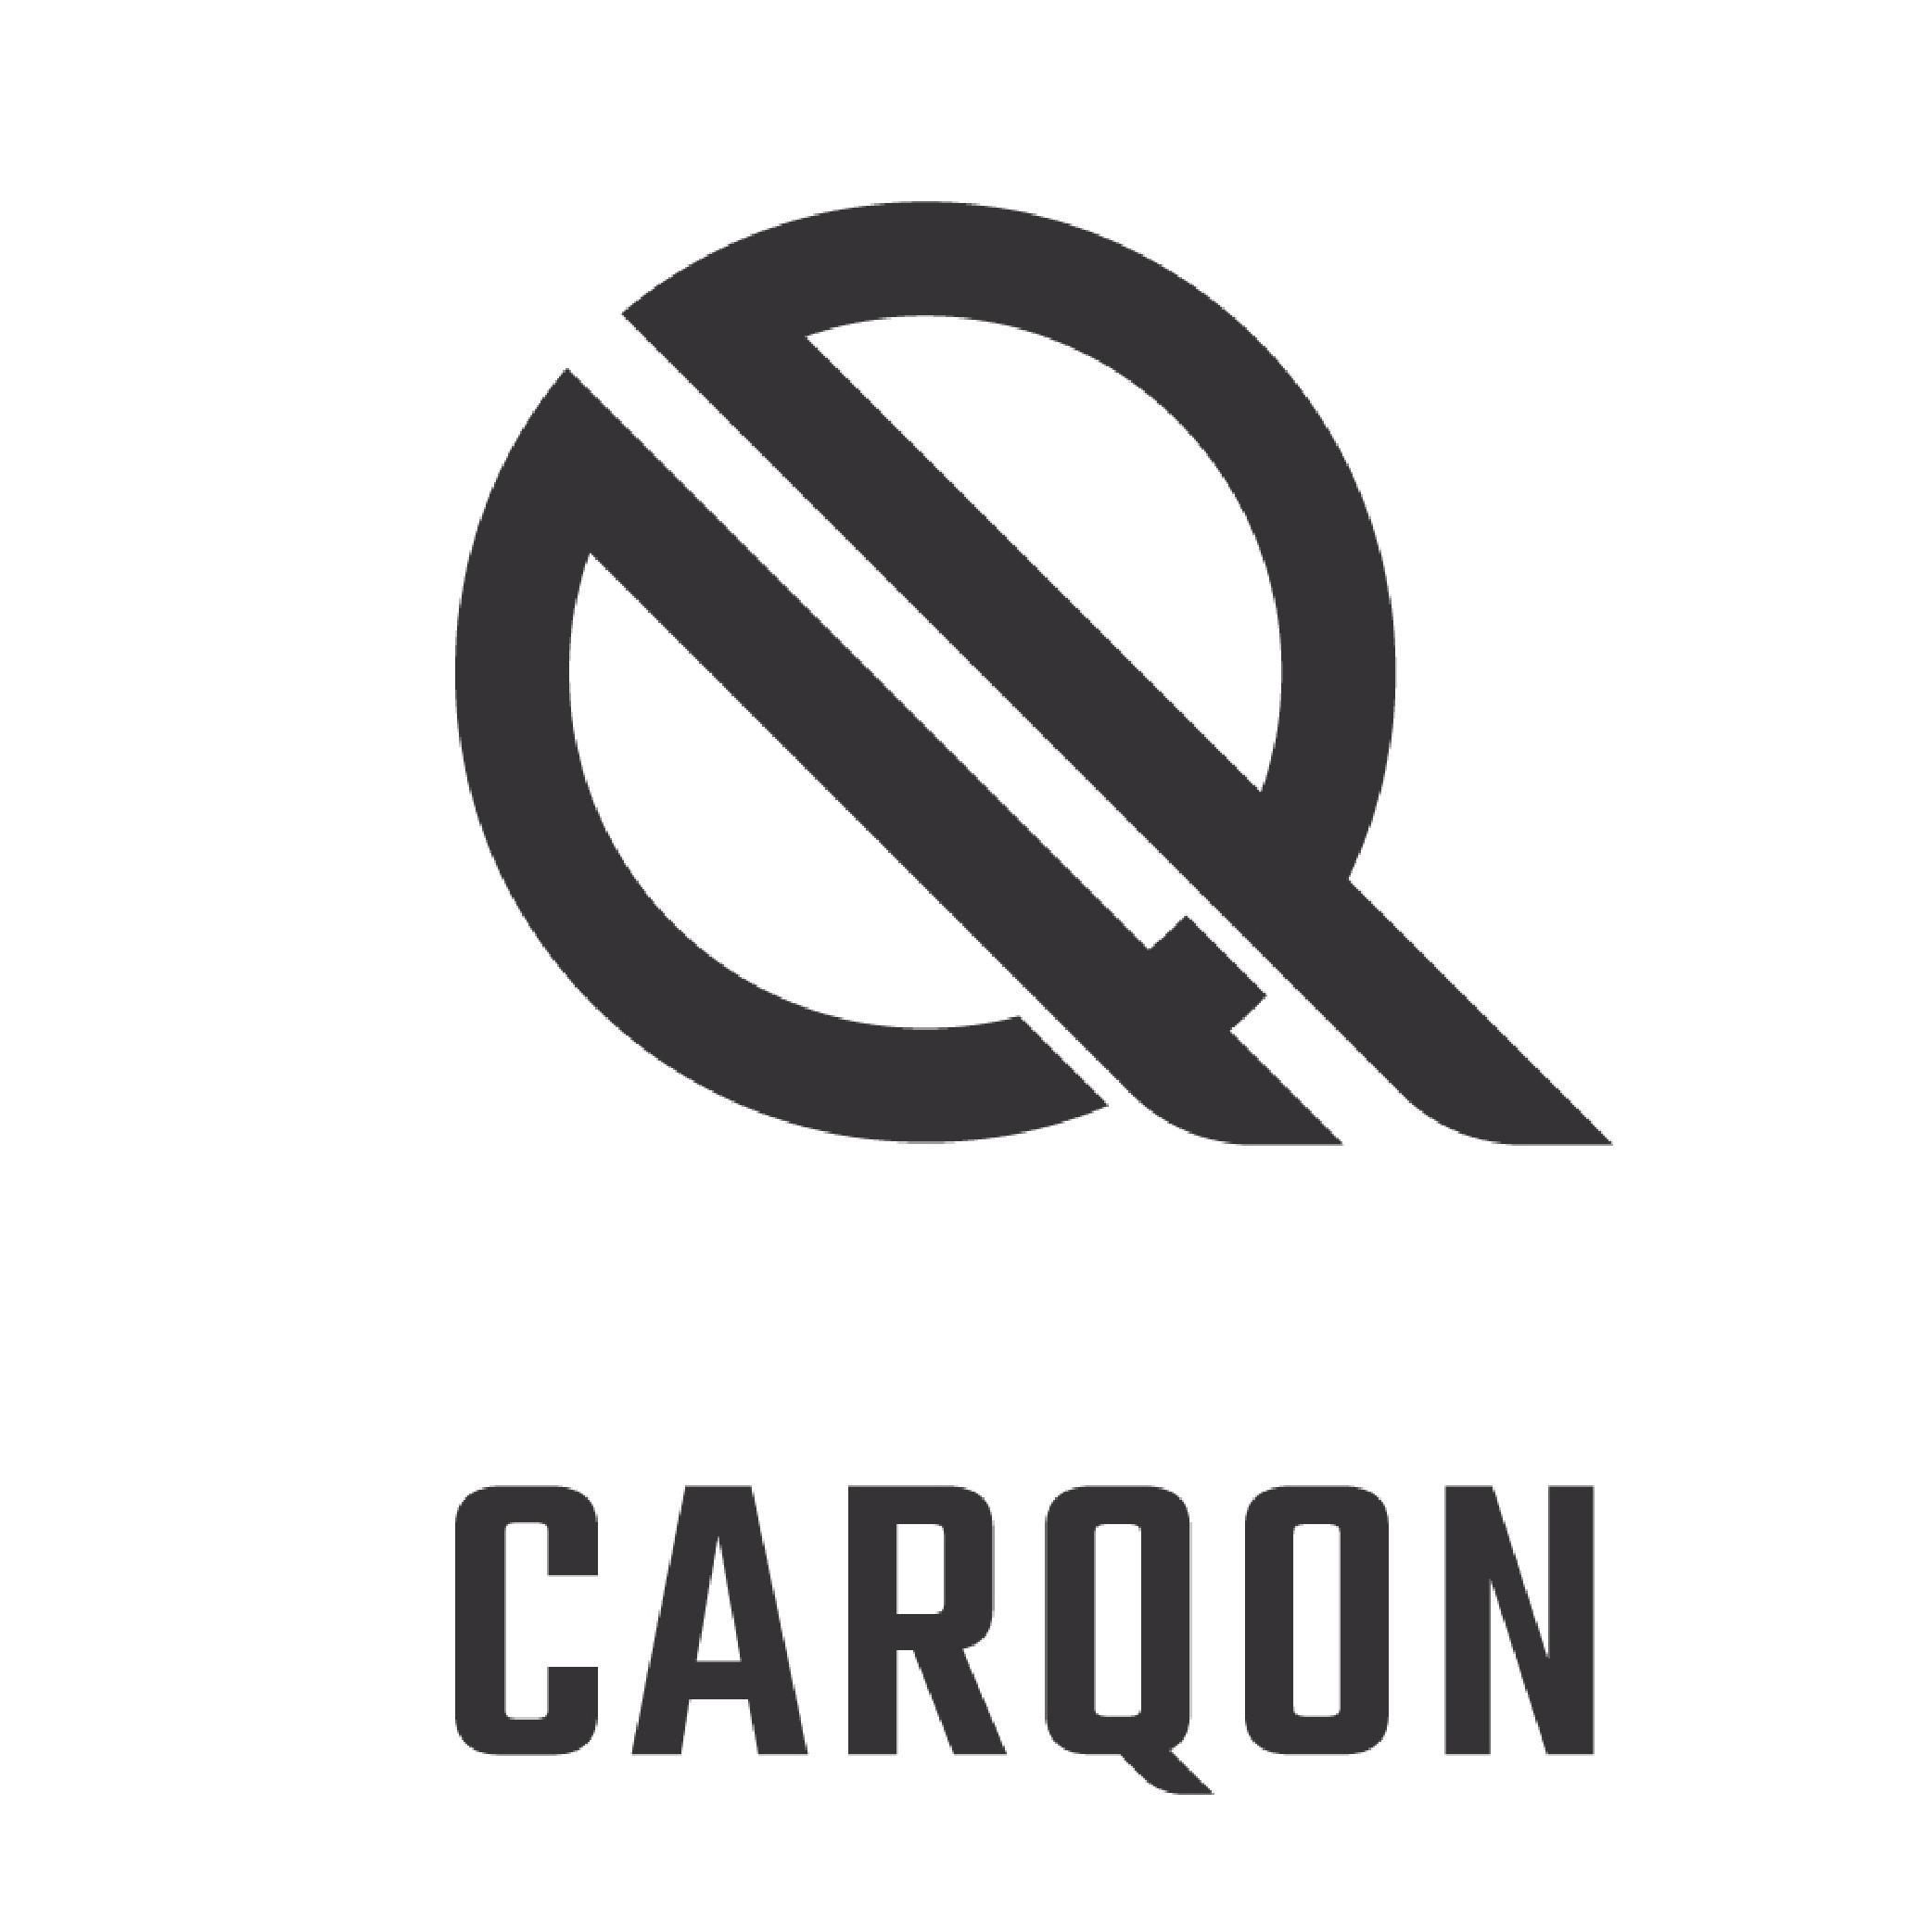 carqon-fietskar-online-kopen